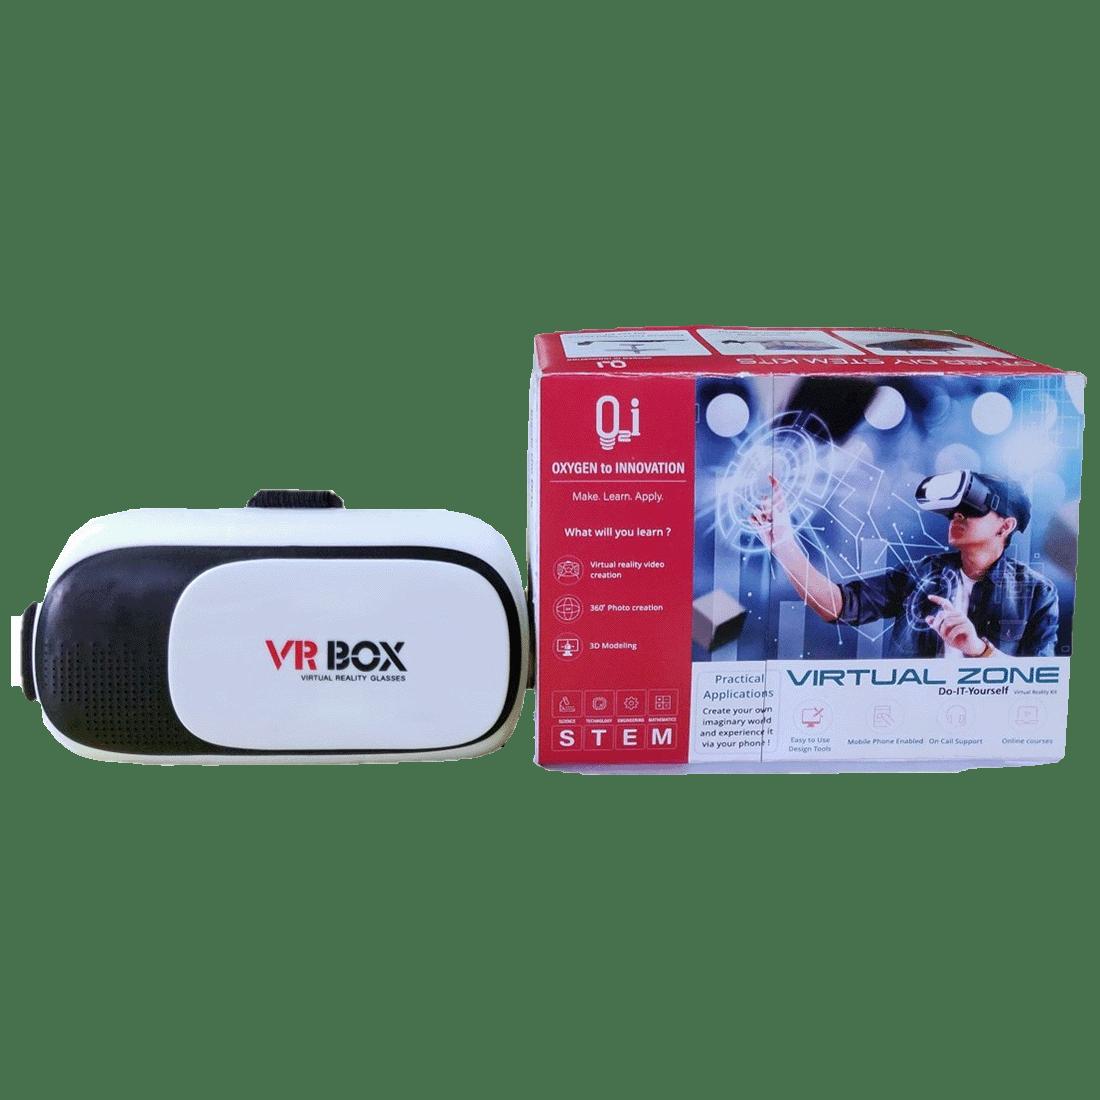 O2i Virtual Reality Box Do It Yourself VR Kit for Beginners (EDU-VR-003, Black)